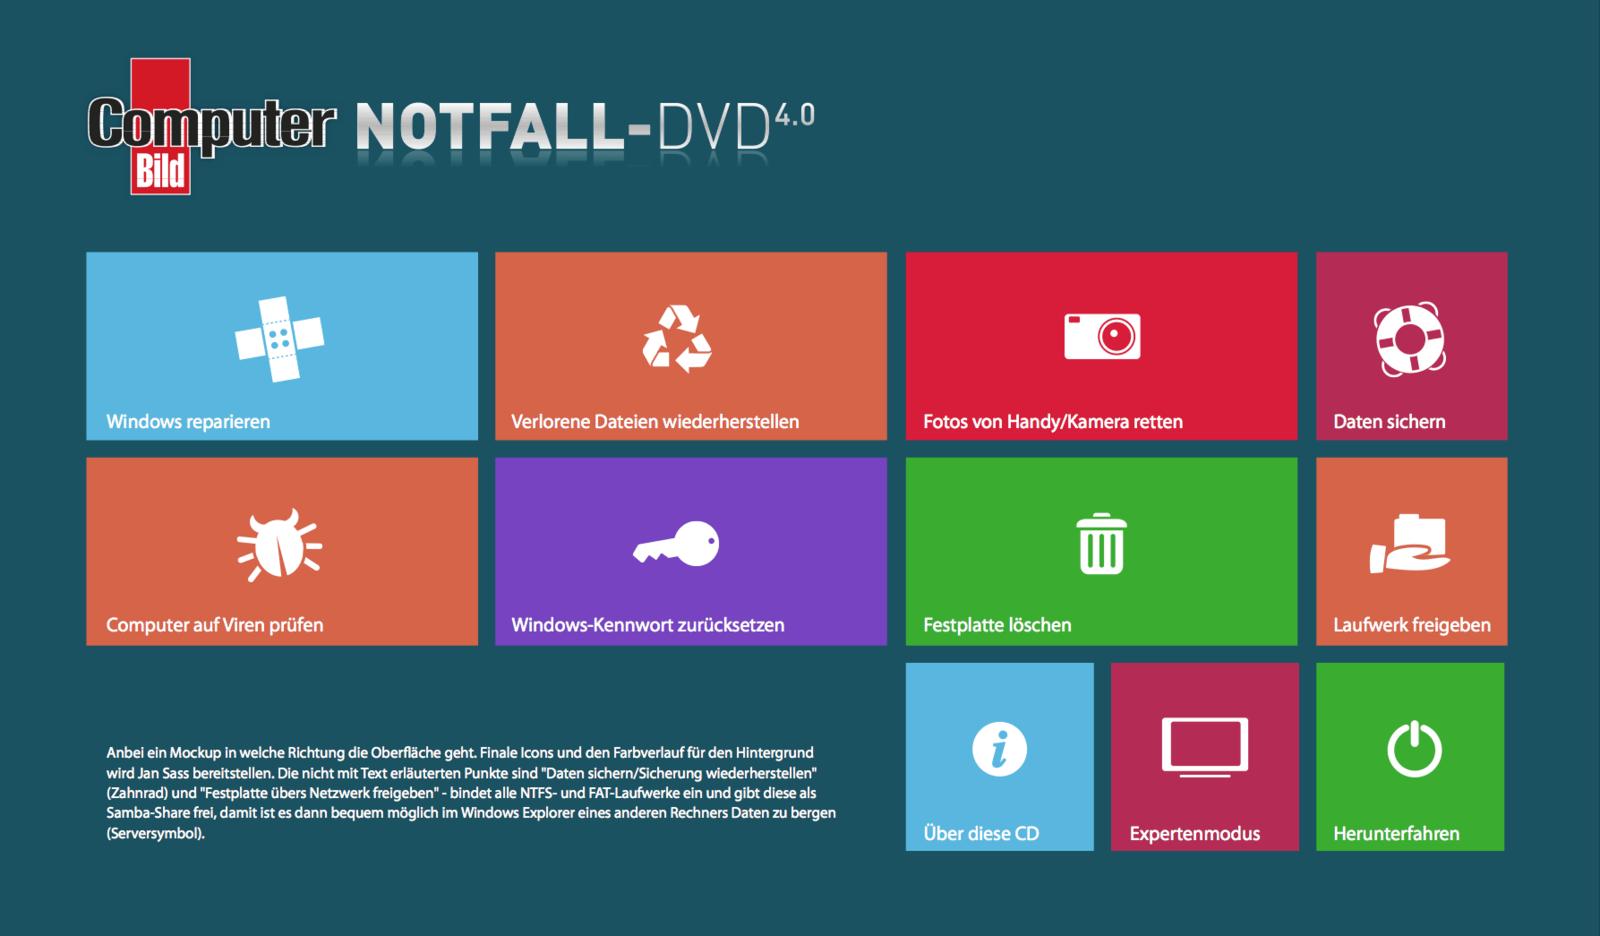 WP8-GUI für ComputerBILD Notfall-DVD 4.0